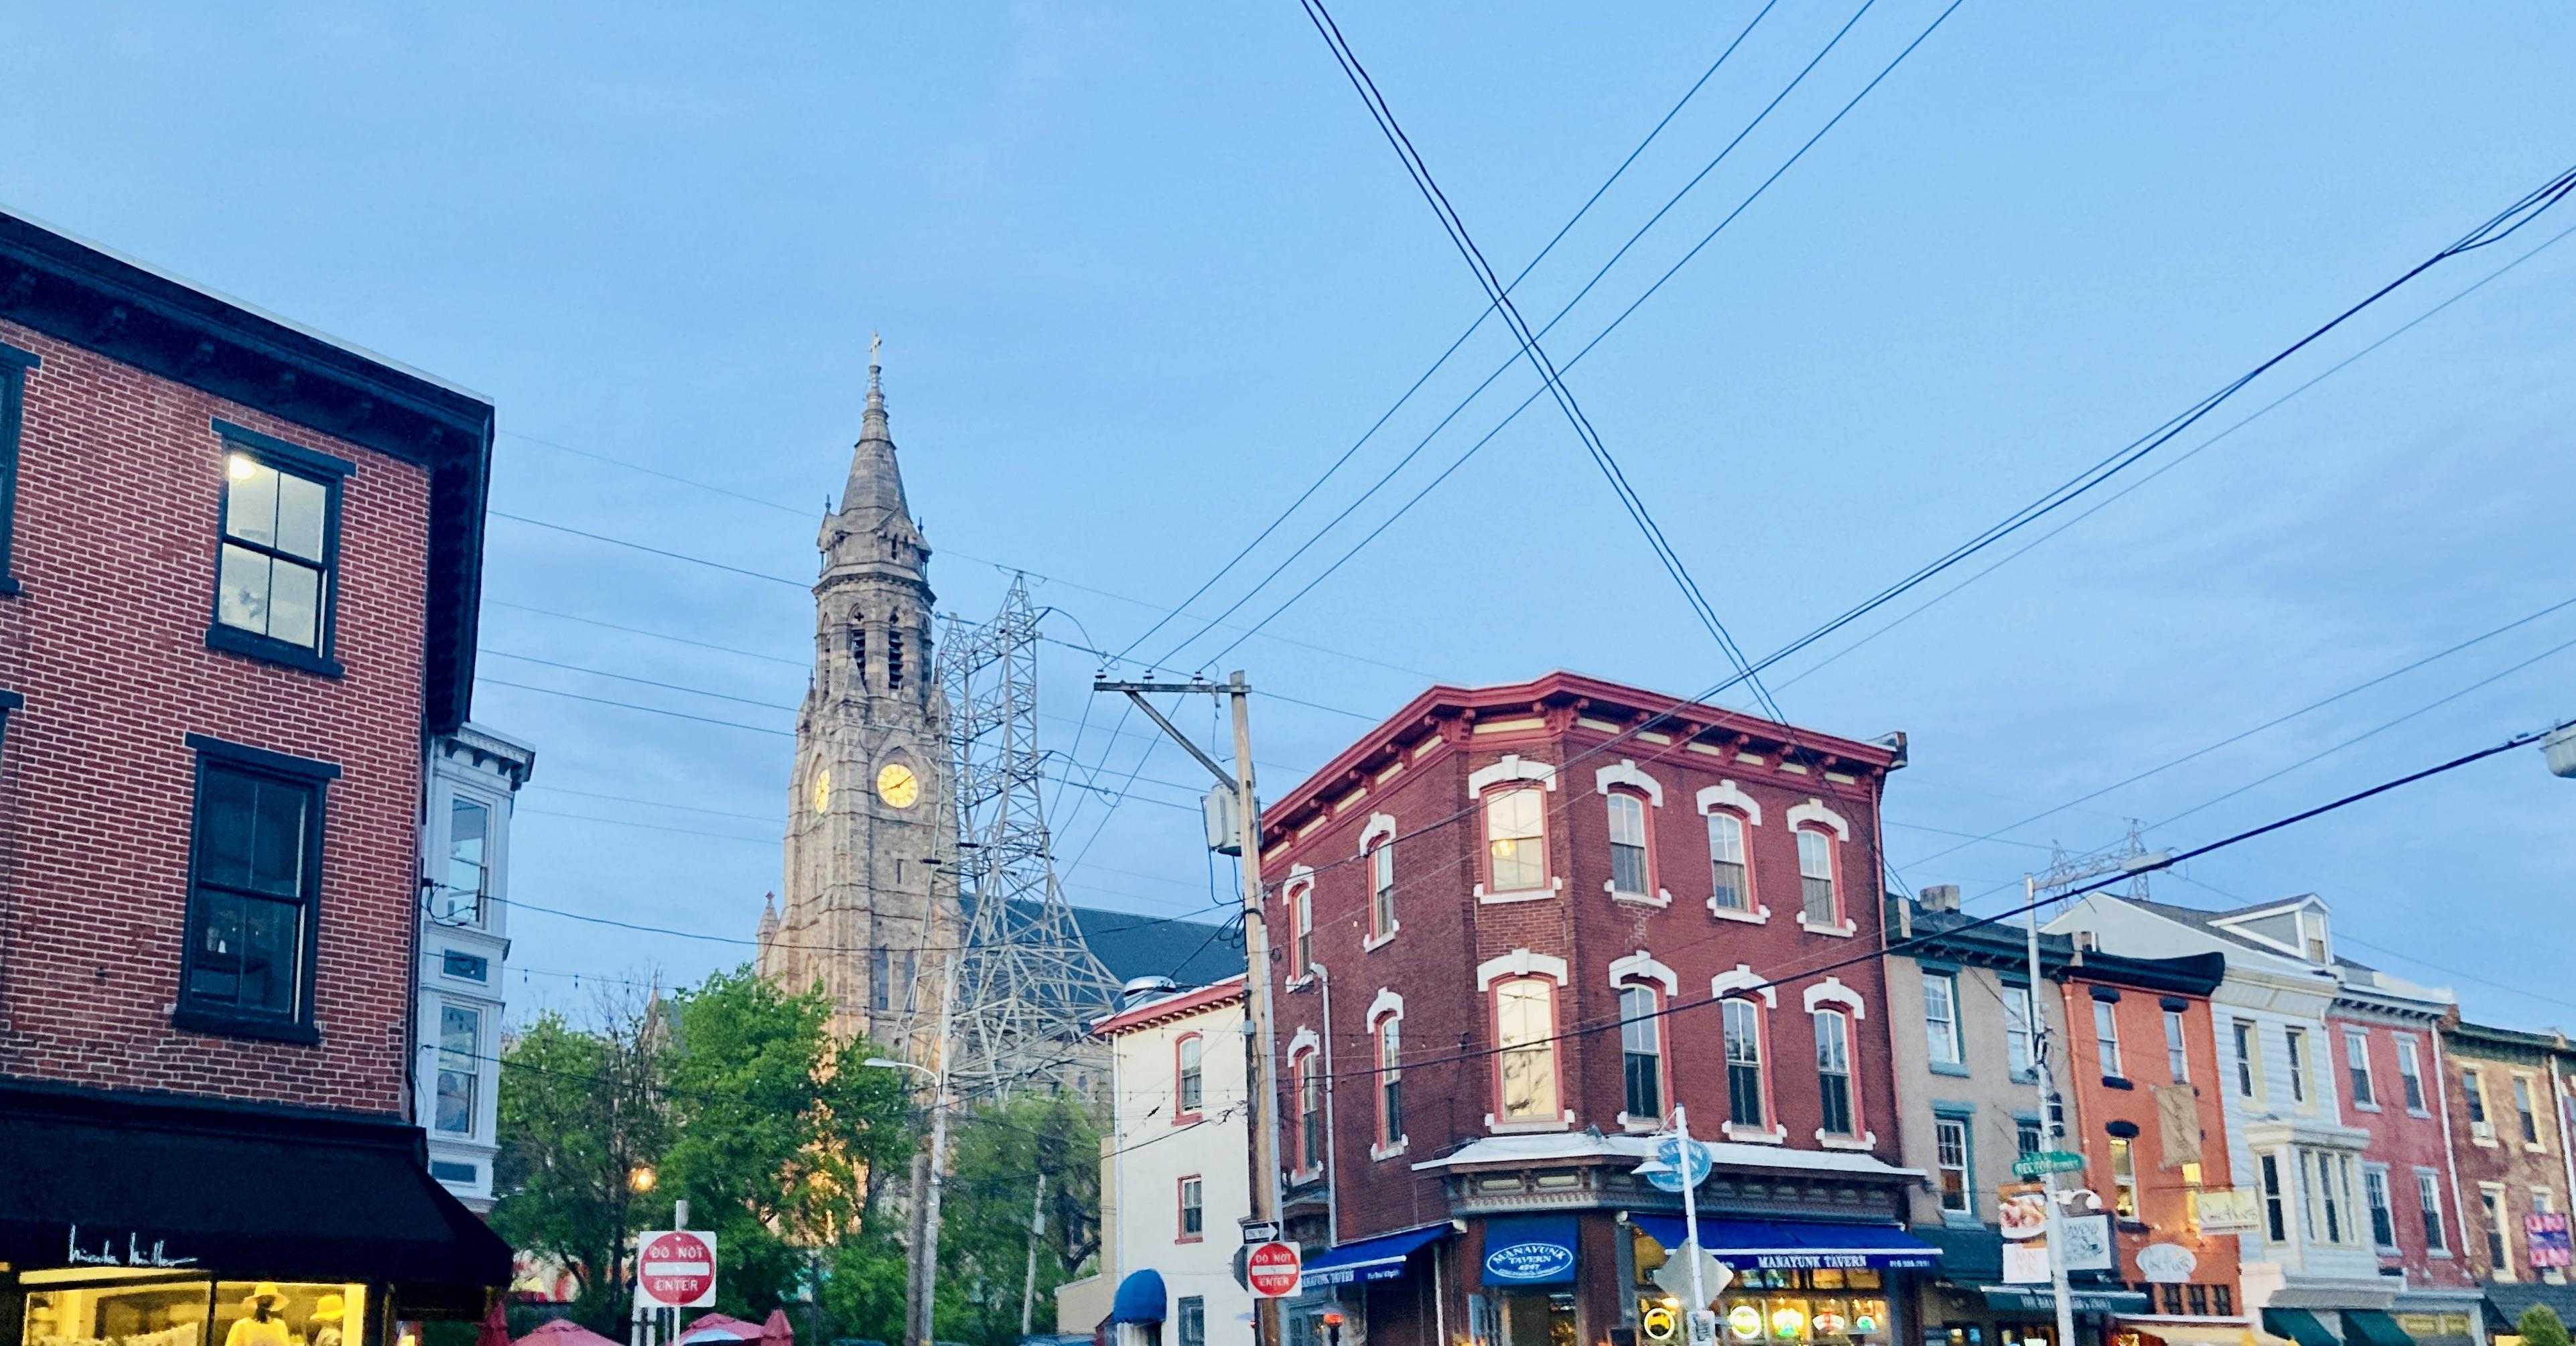 Main St Manayunk and St John the Baptist Church